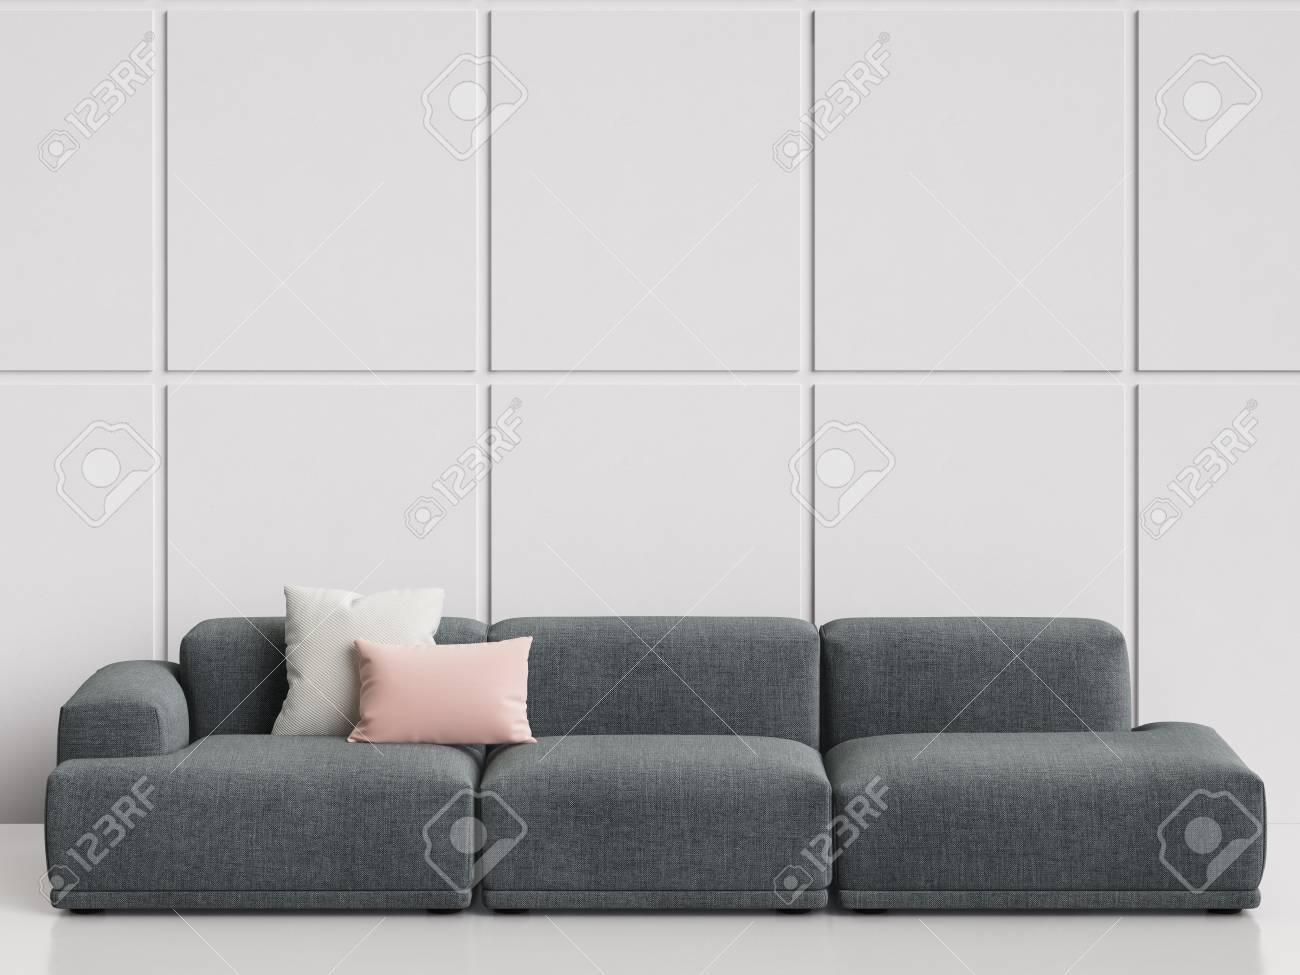 Modern Scandinavian Design Sofa In White Empty Interior.Copy.. Stock ...